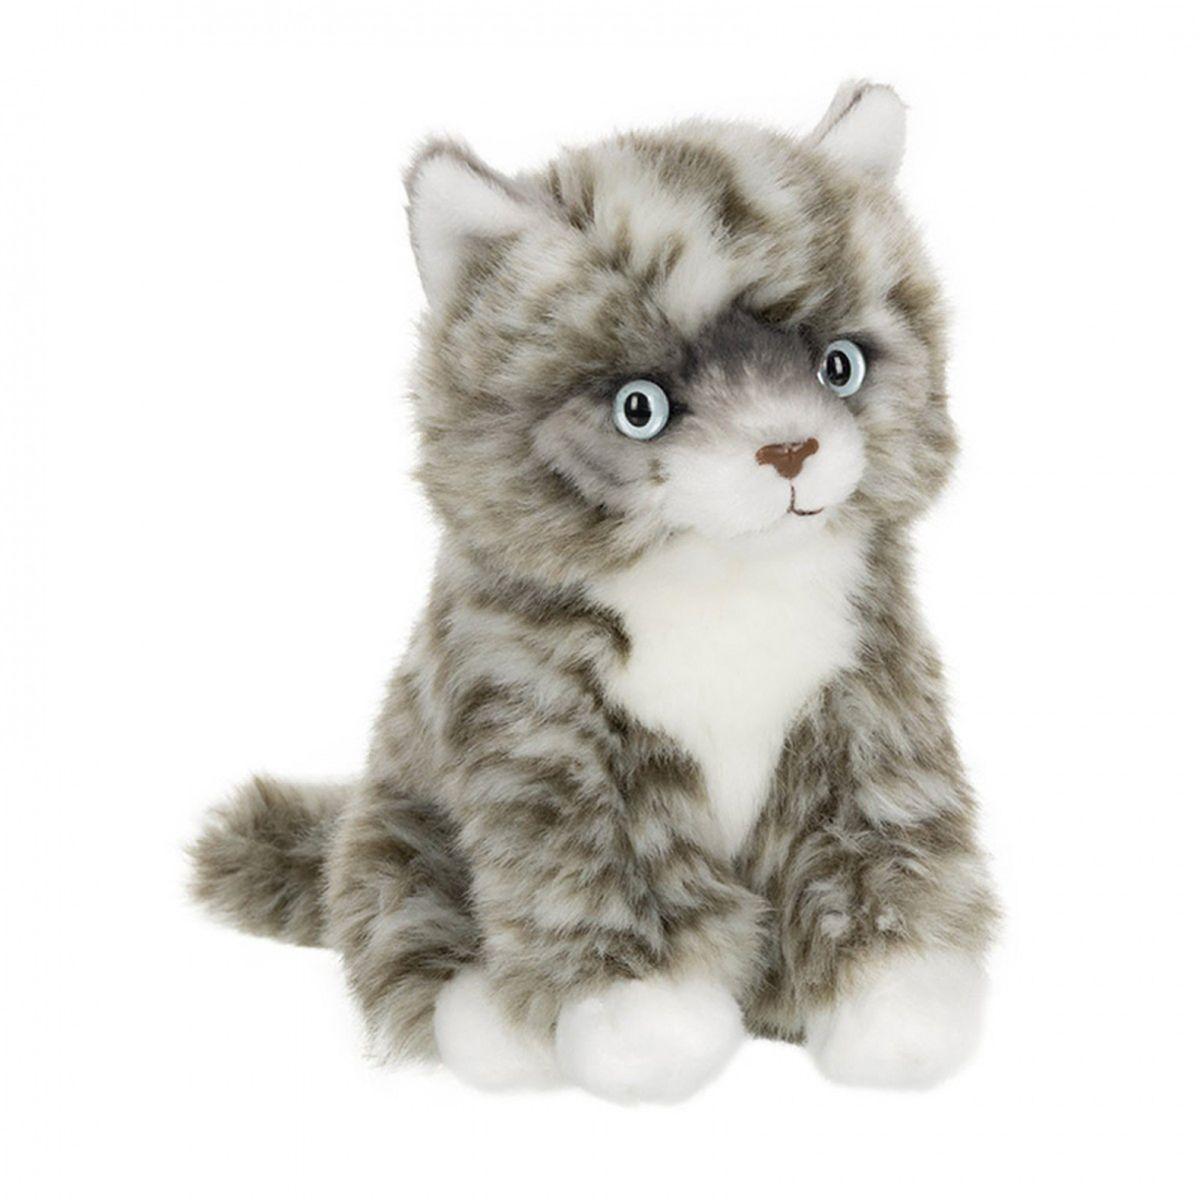 Anna Club Plush Котёнок Табби короткошерстный серебряный, сидит 15 см anna club plush мягкая игрушка бассет хаунд 18 см